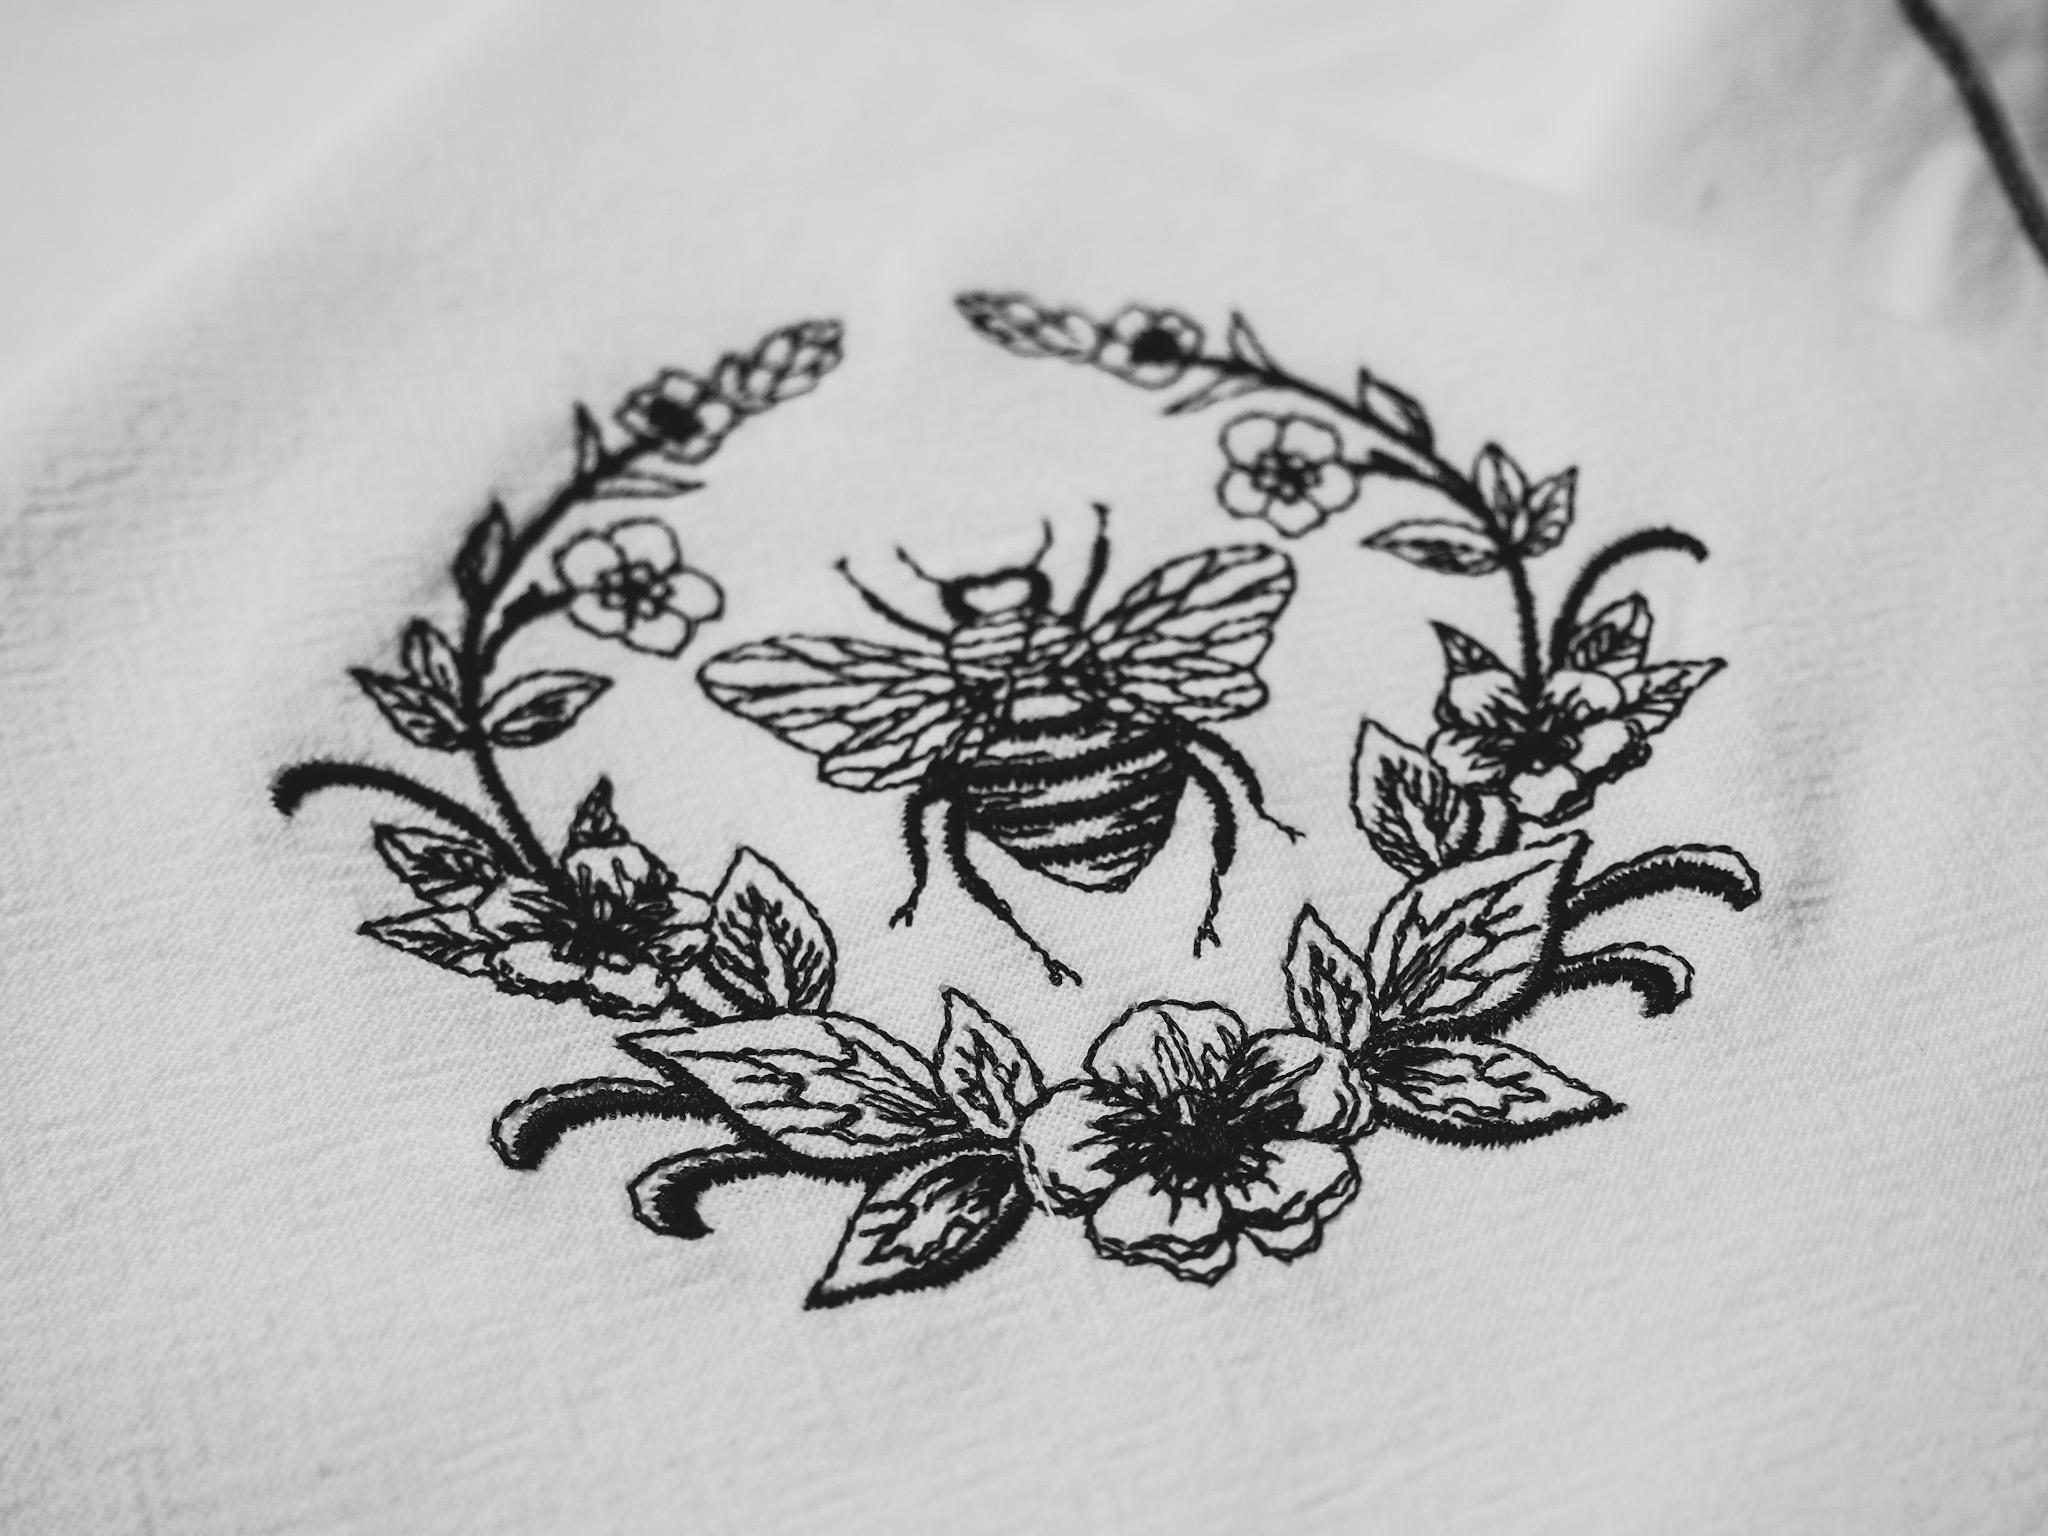 Bee Towel, Honey Bee Towel, Flour Sack Towel, Bee design, tea towel, black thread, white towel